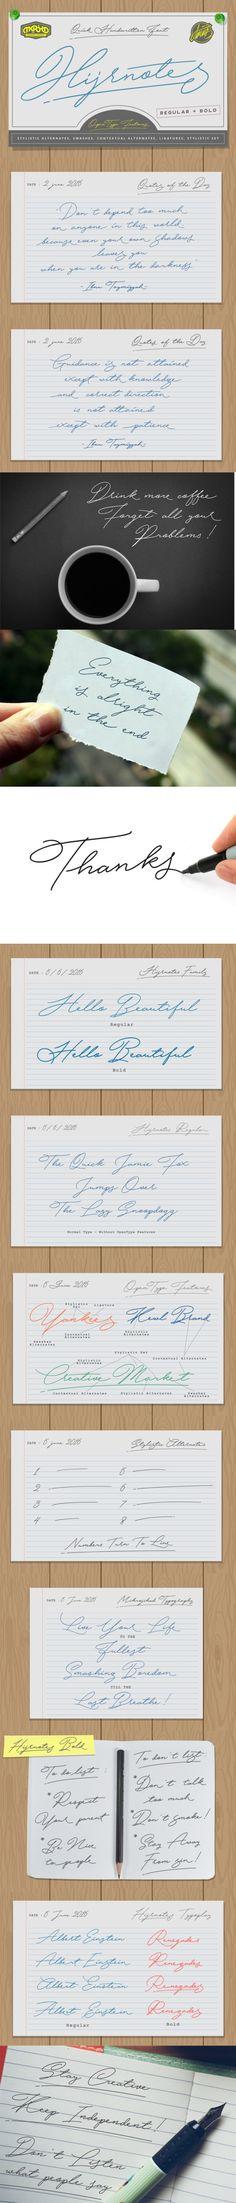 cursive fonts for wedding cards%0A indian wedding reception invitation wording samples